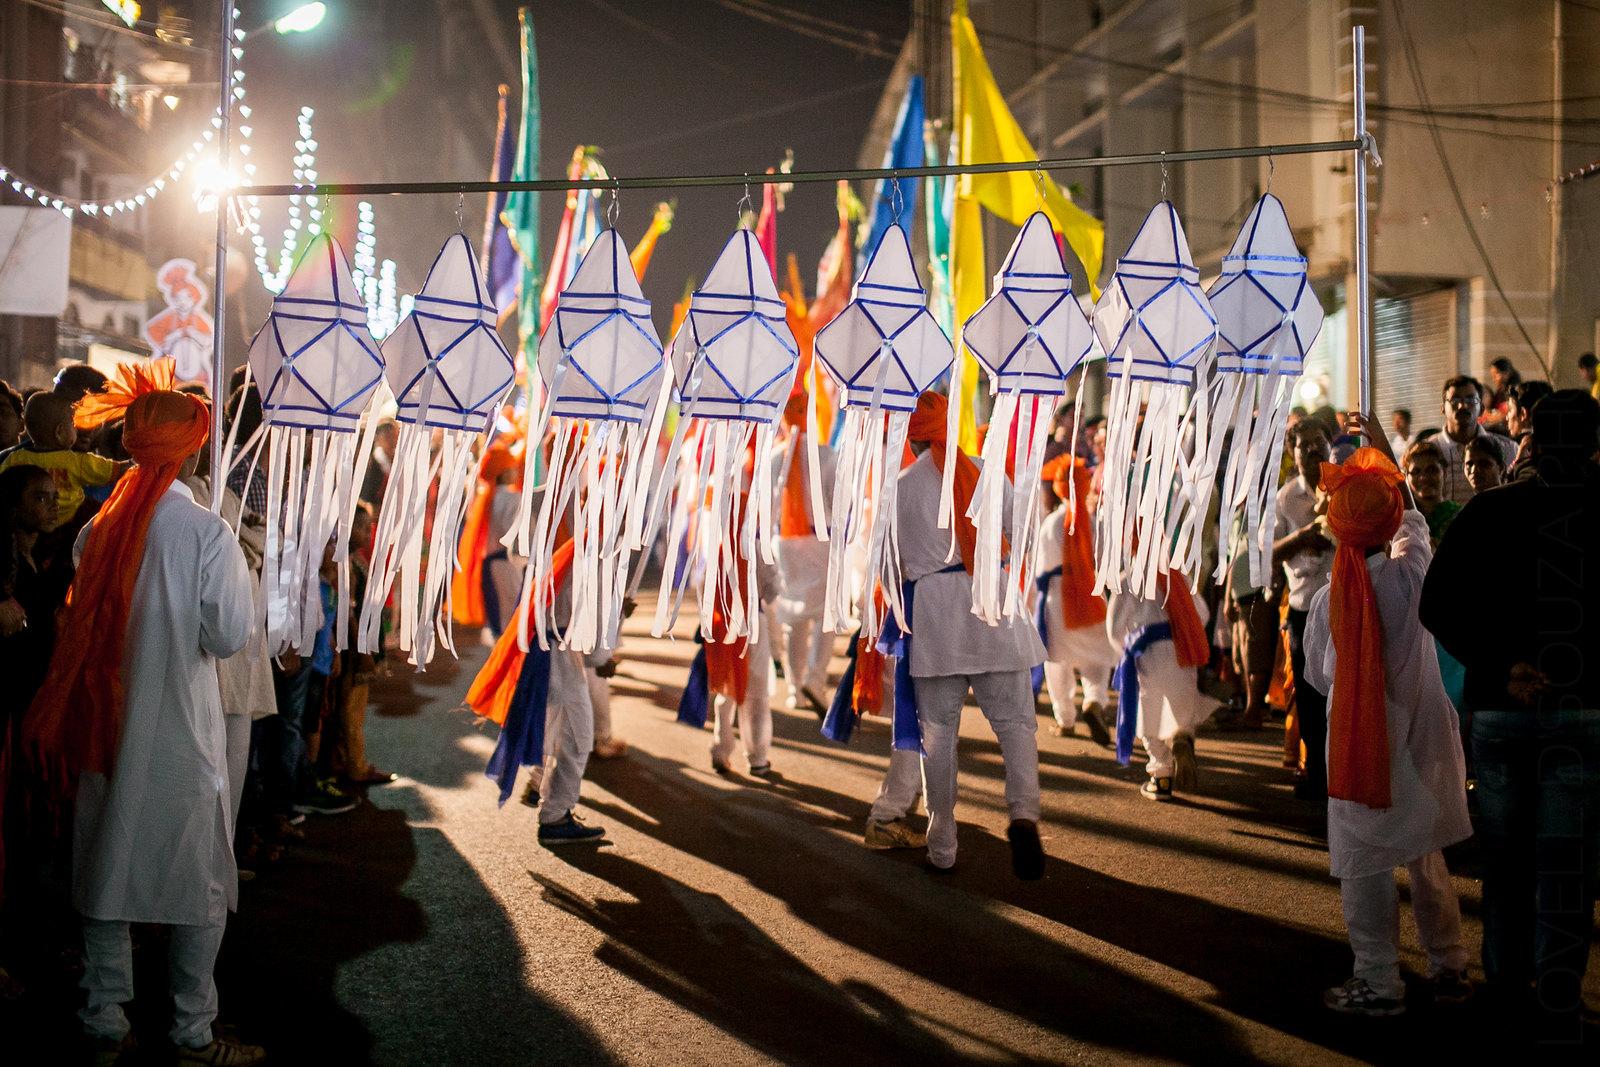 Shigmotsav 2015 - Ponda, Goa